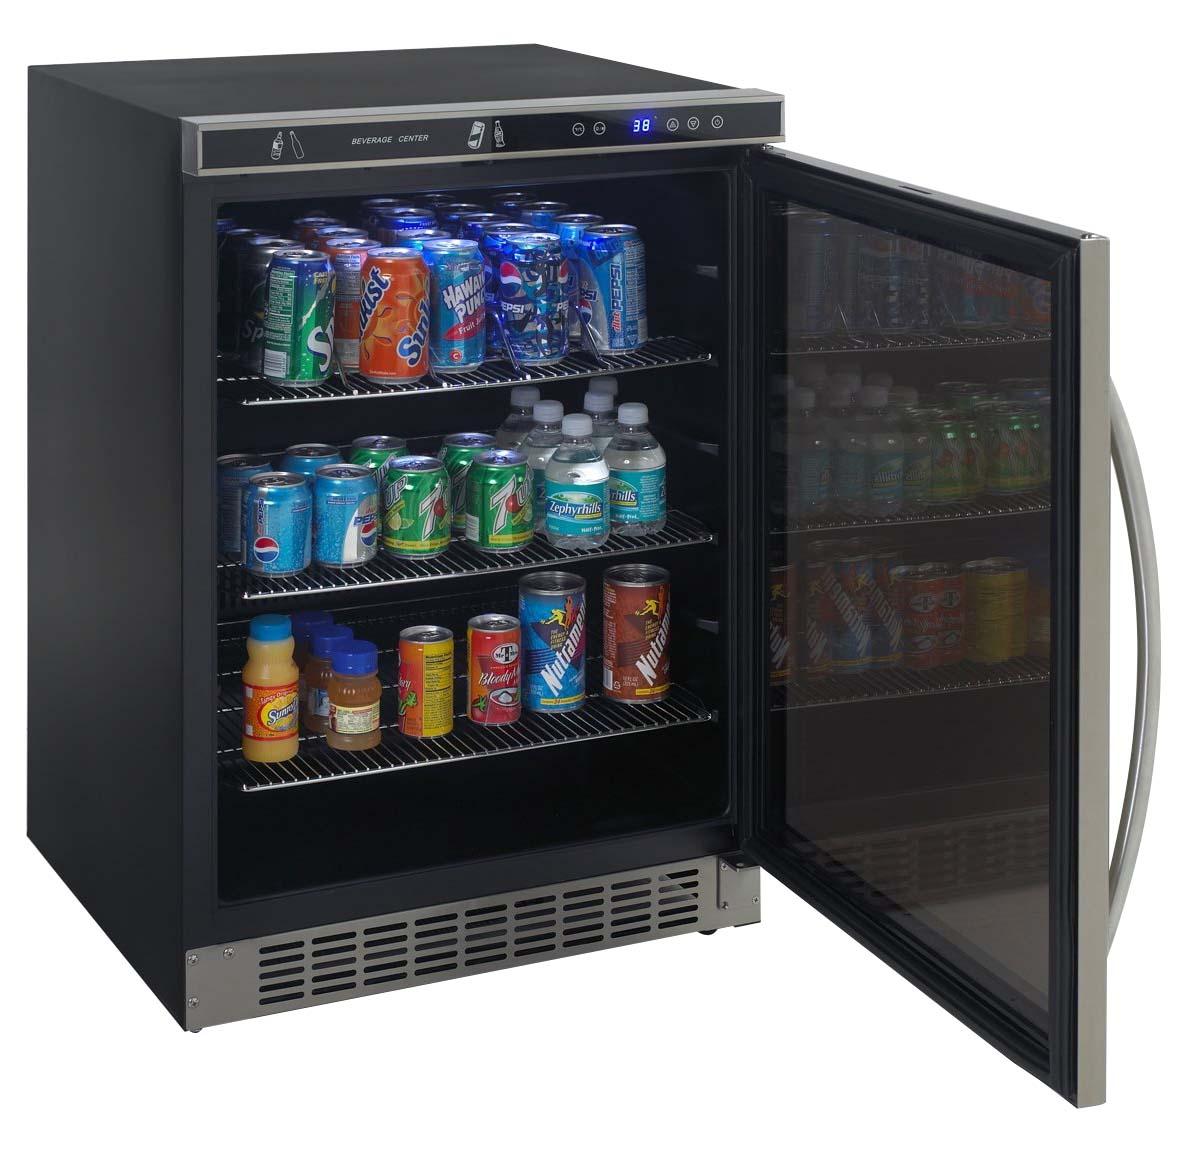 bca5105sg1 - Beverage Center